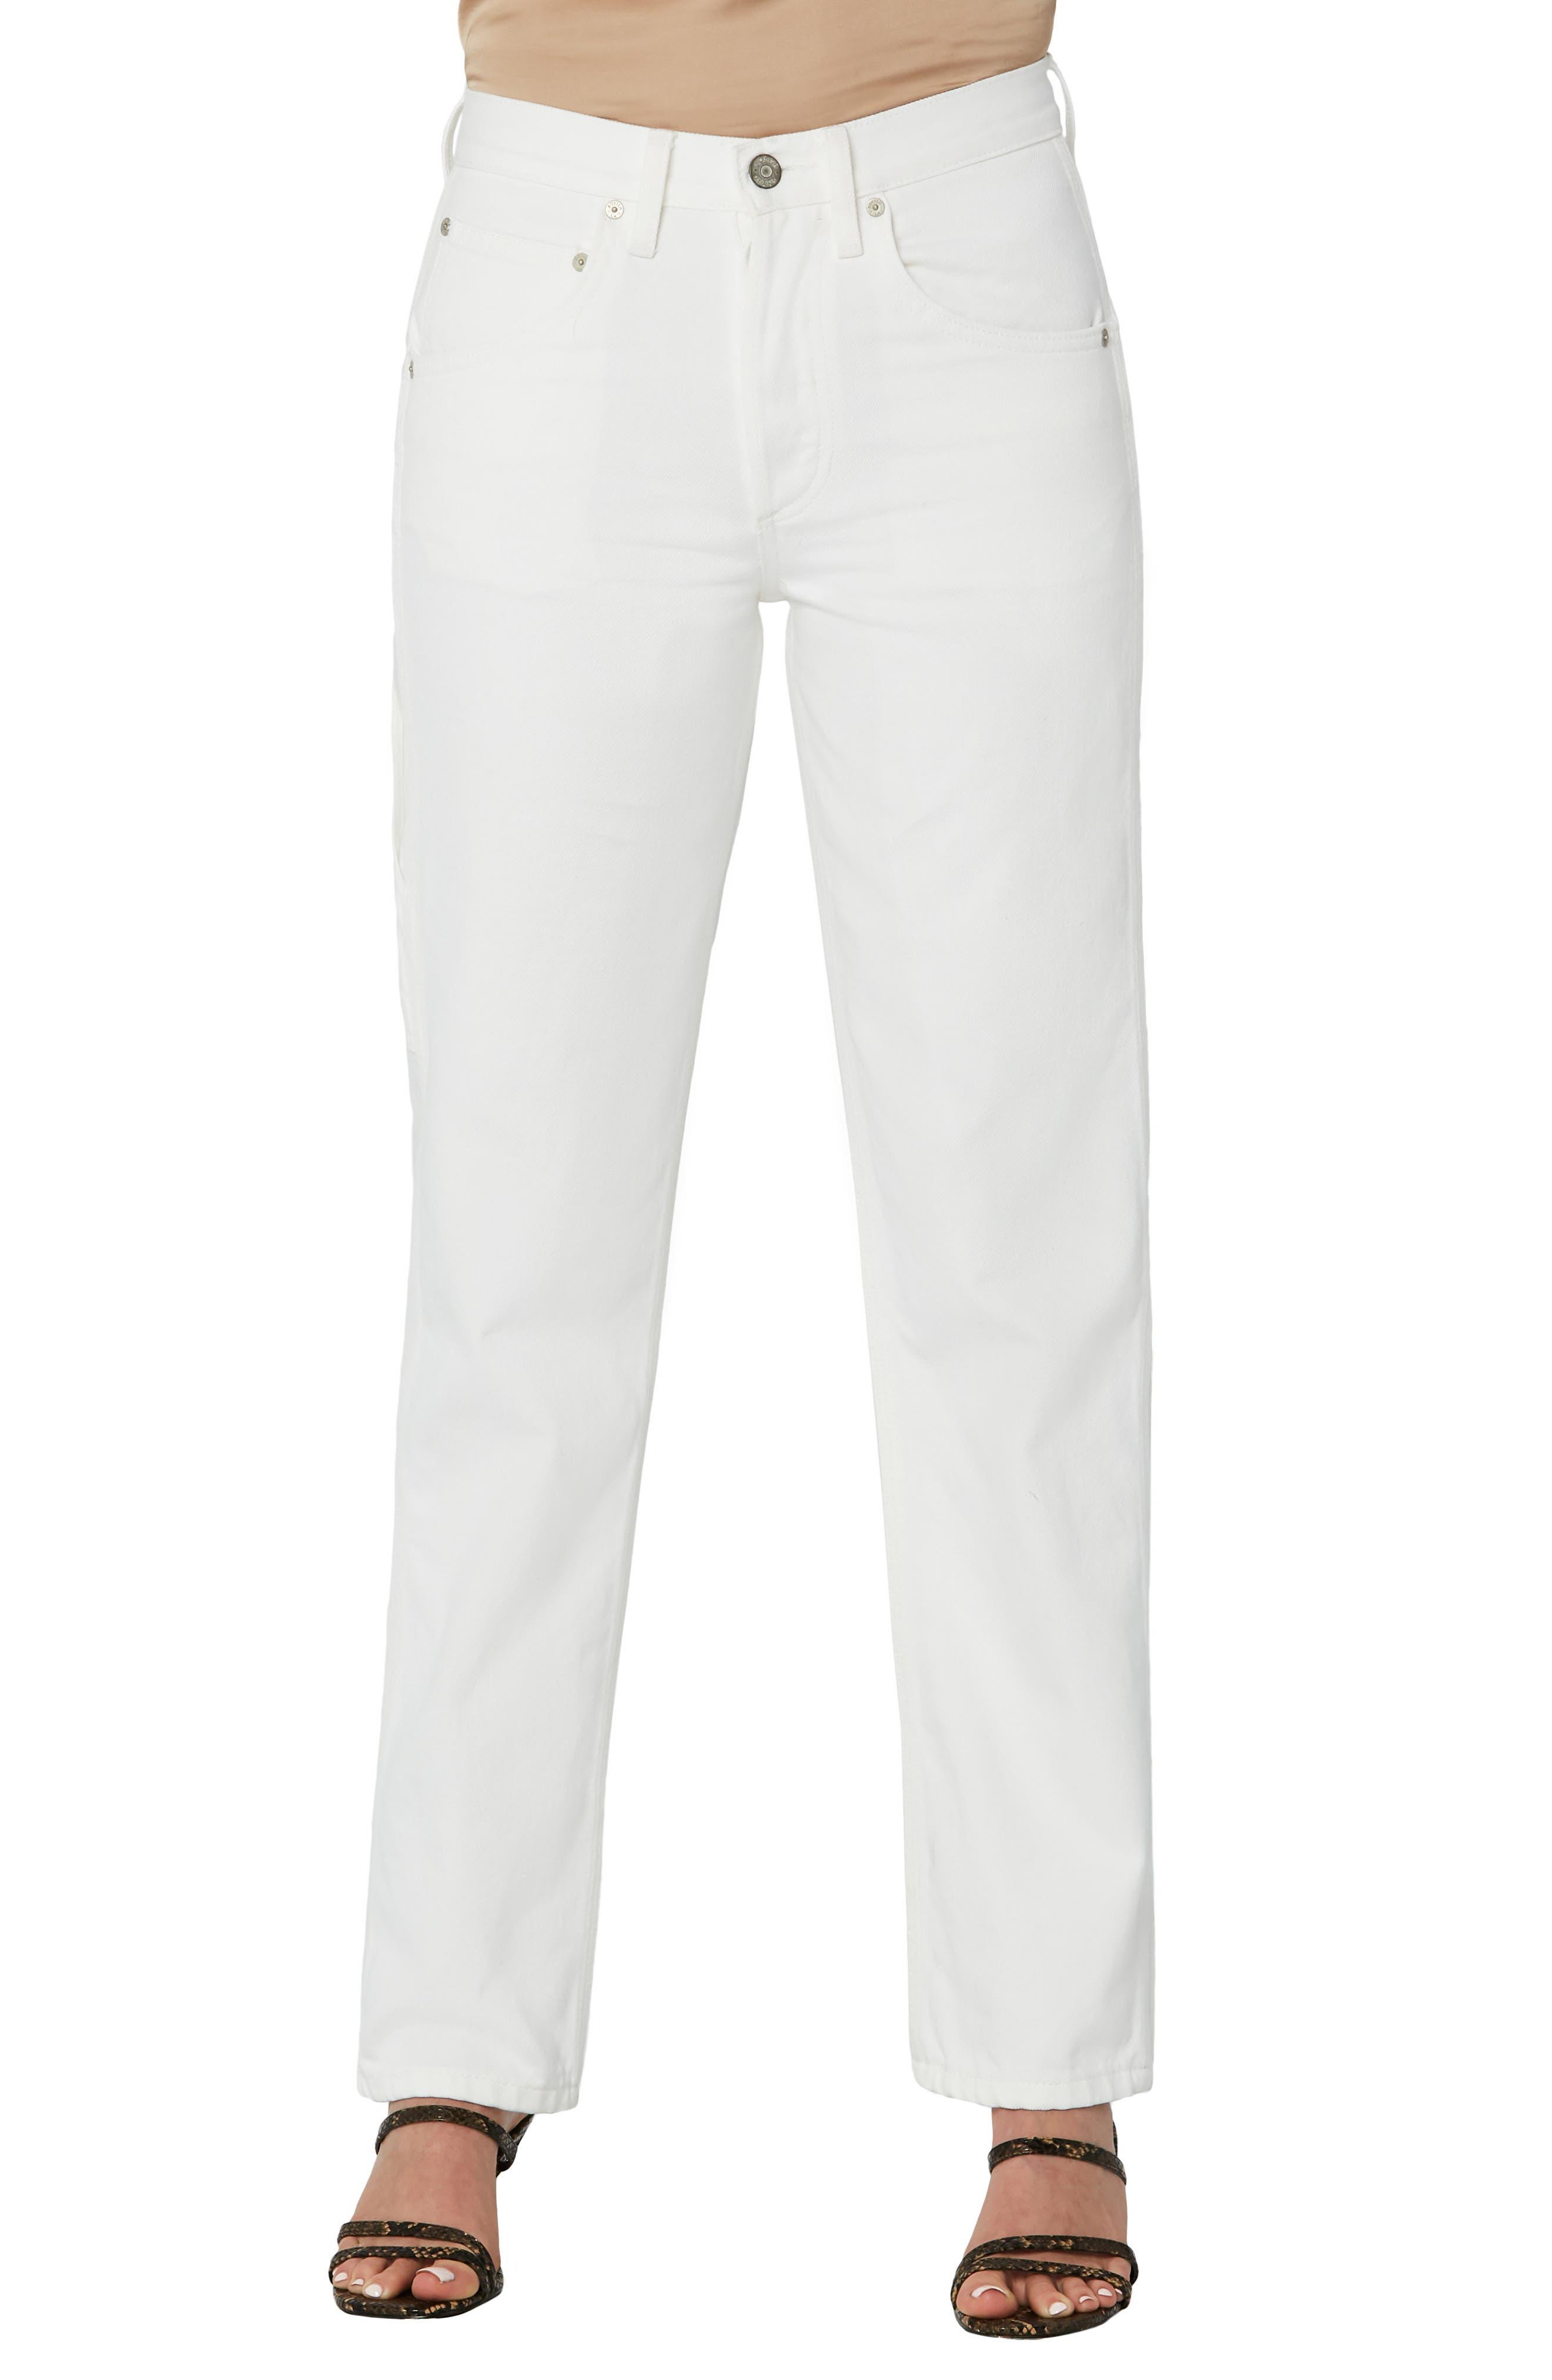 The Bailey High Waist Organic Cotton & Lyocell Jeans